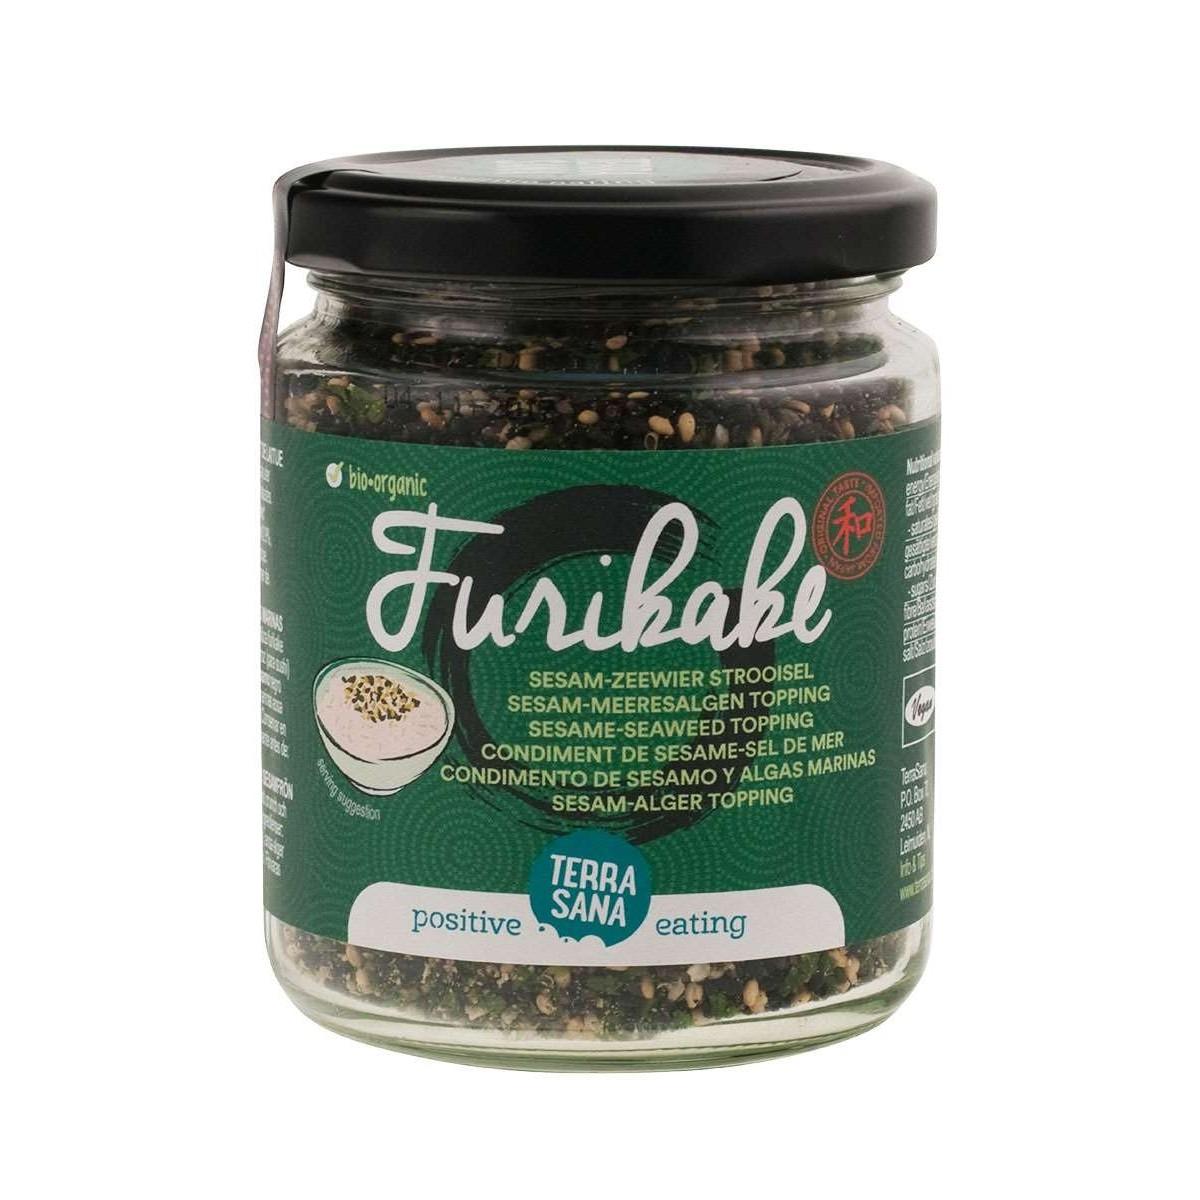 Furikake